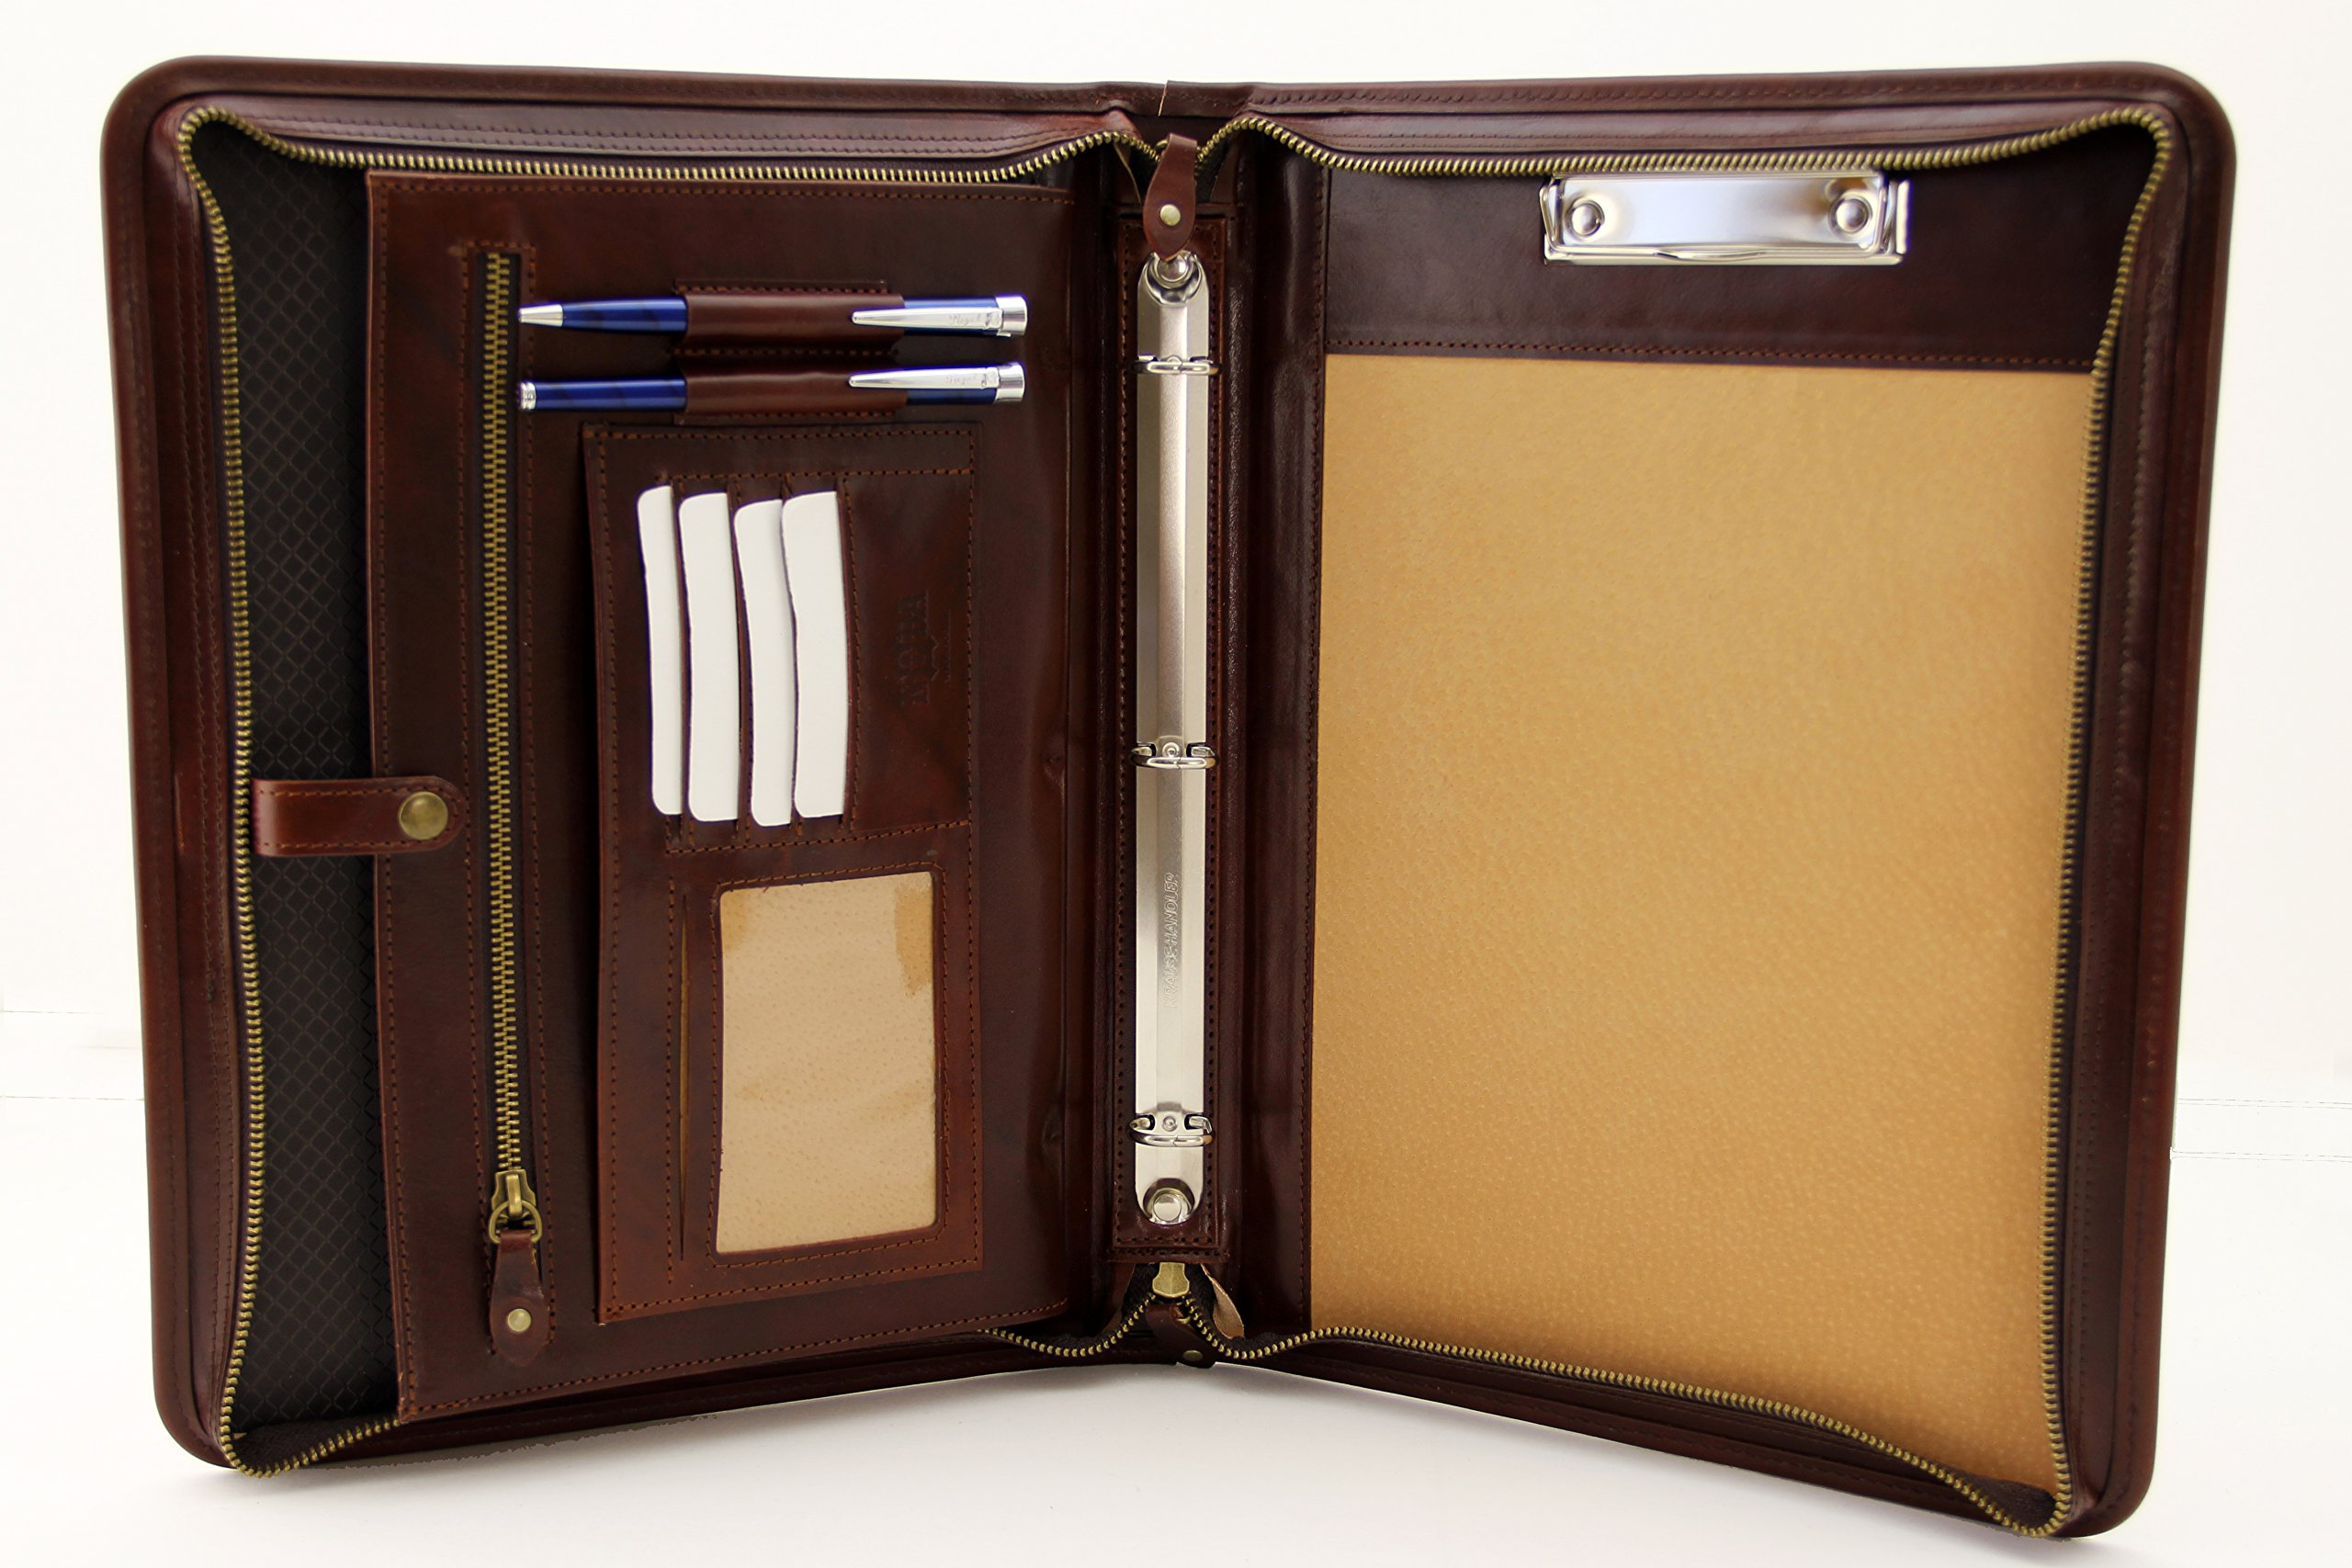 Noda Executive Leather Padfolio 3 ring binder Professional Business Portfolio w/ Zippered Closure | Resume, Document, Notepad, Tablet, Clipboard, Writing Pad Organizer | Men, Women (Caognac)